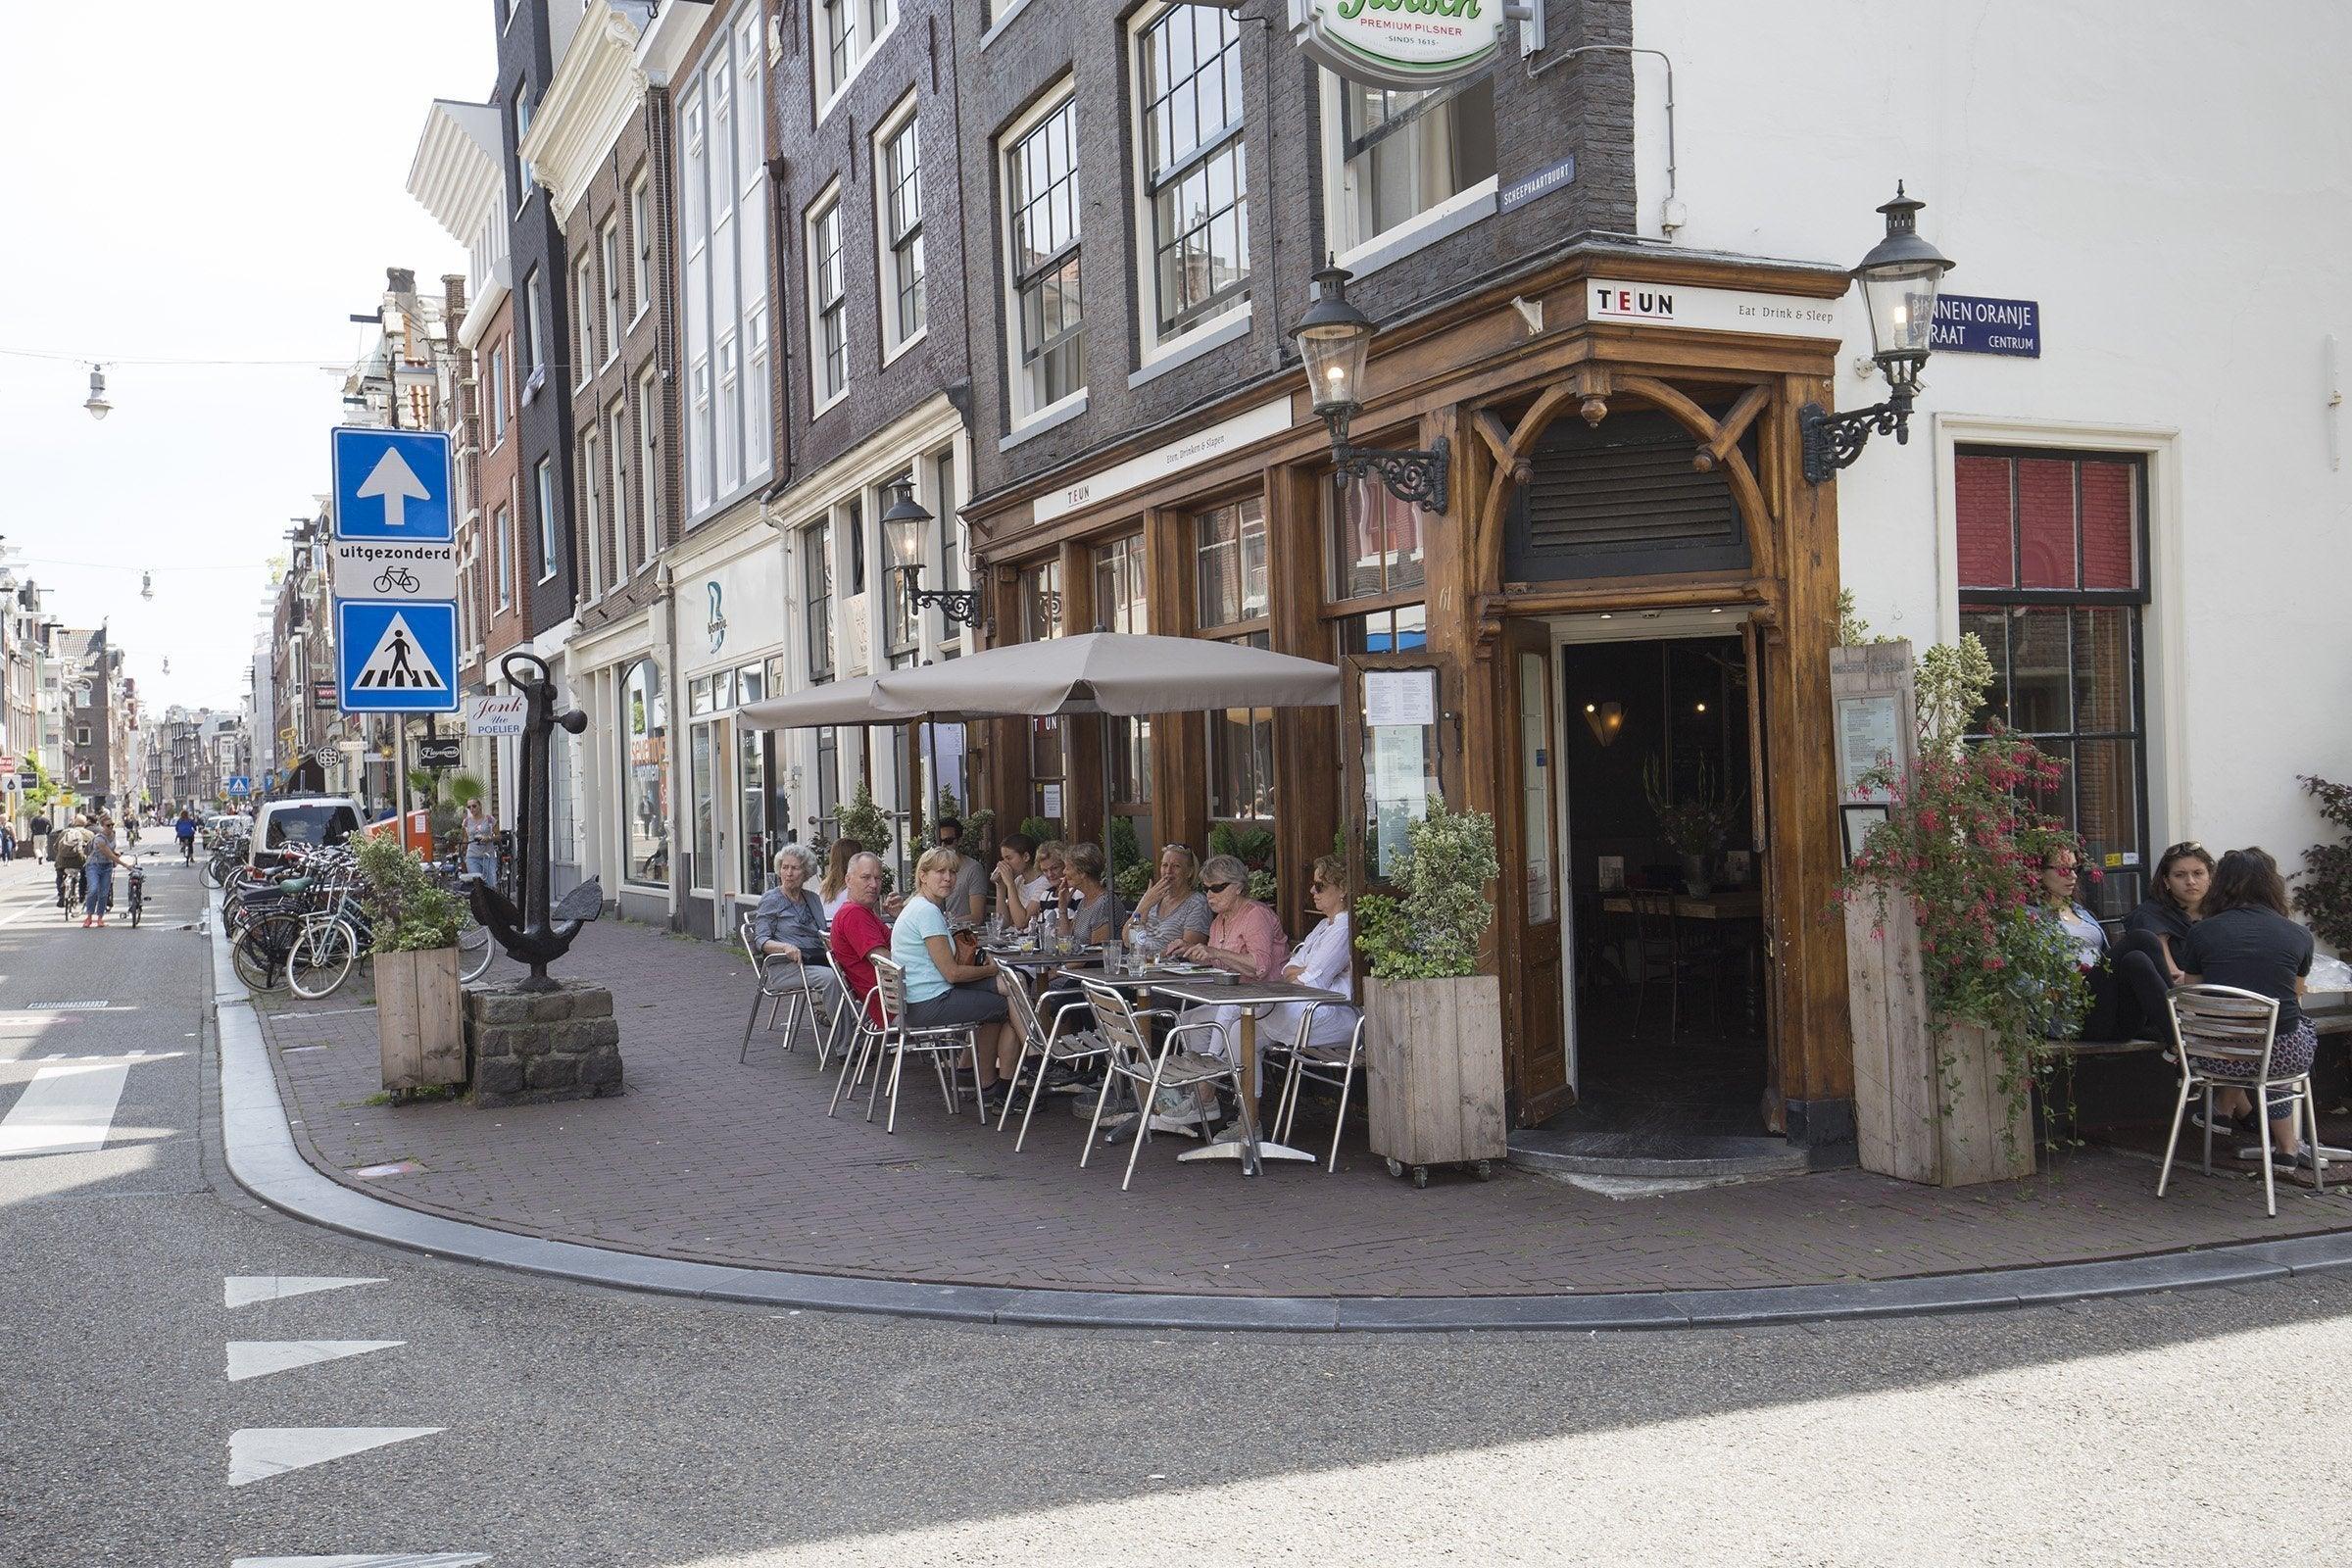 https://public.parariusoffice.nl/15/photos/huge/1725.1500463858-516.jpg